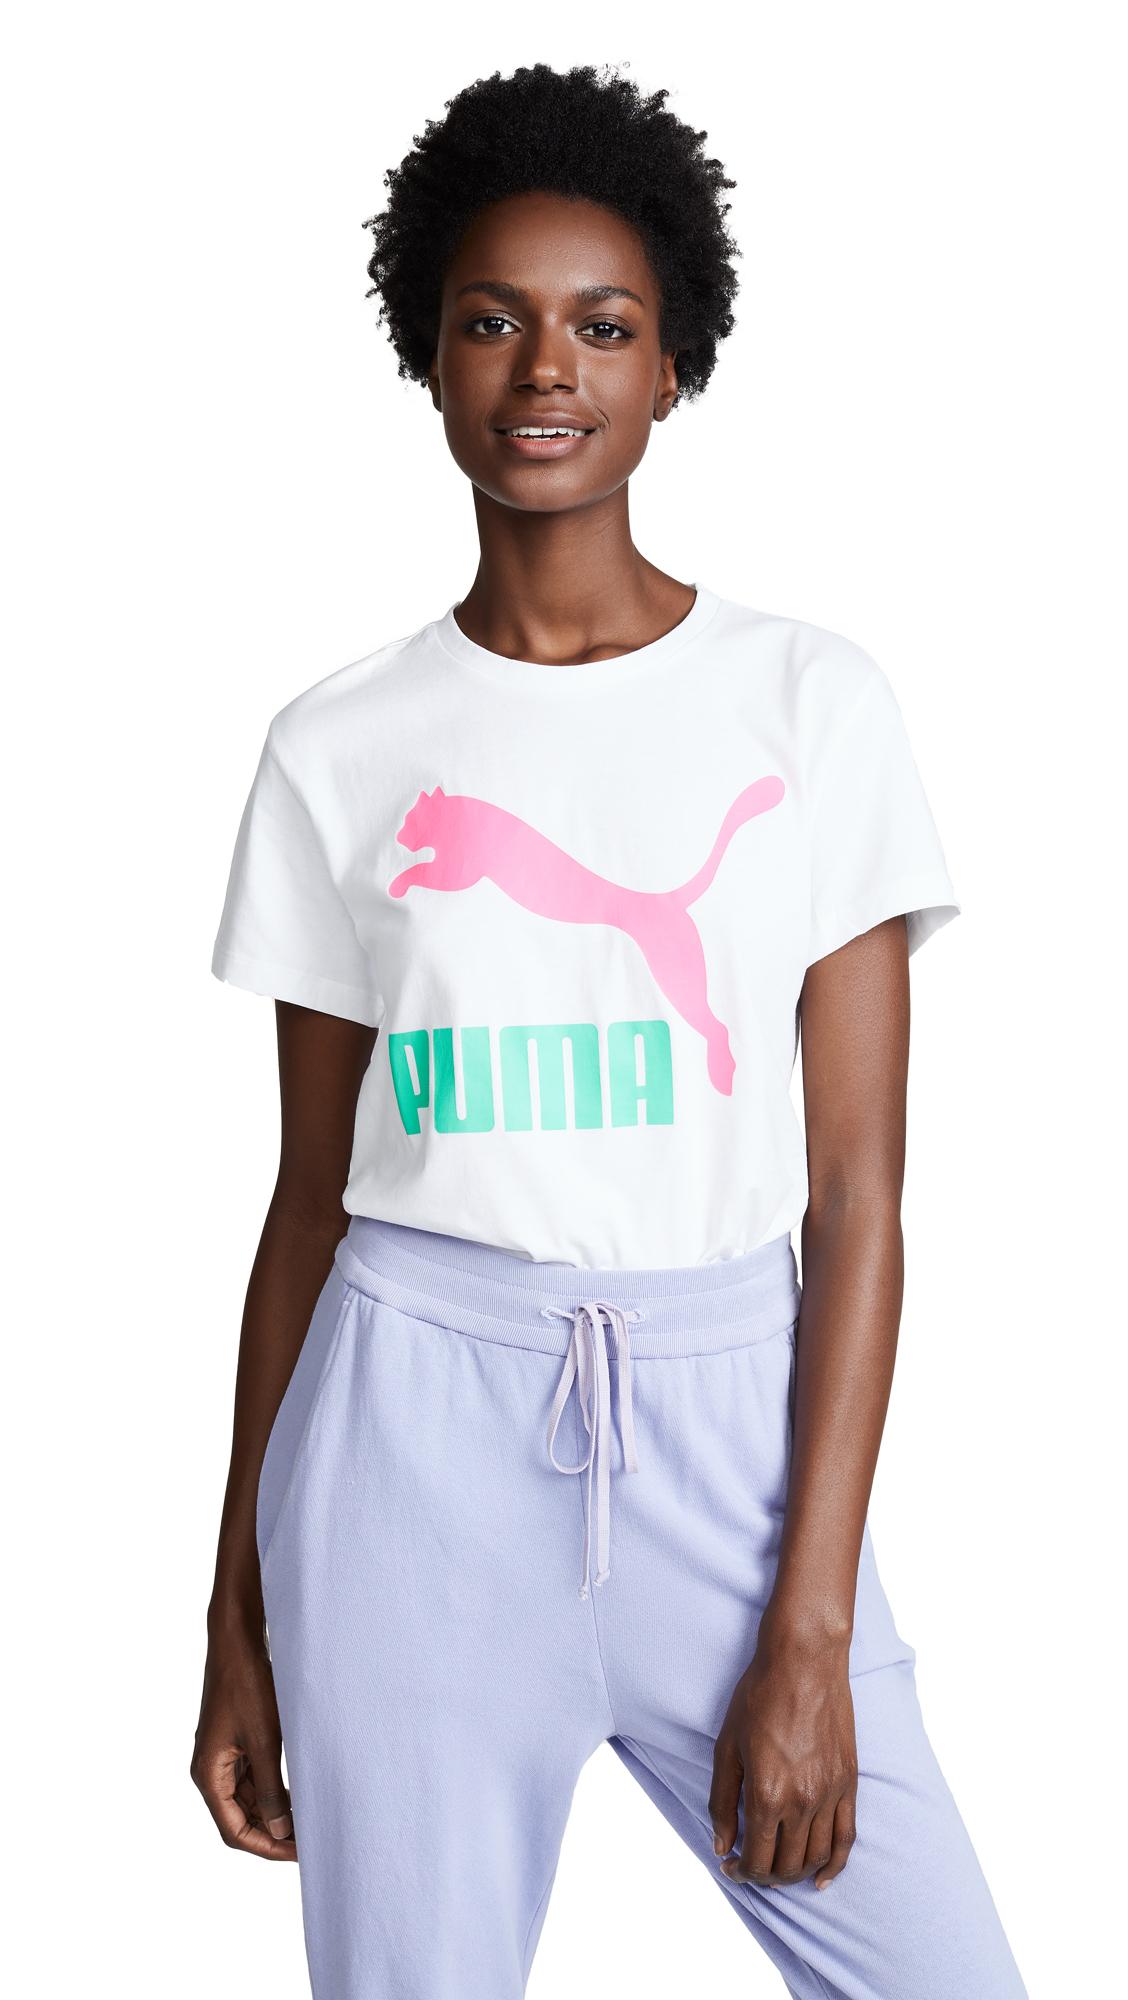 PUMA PUMA Classics Logo Tee - Puma White/Pink